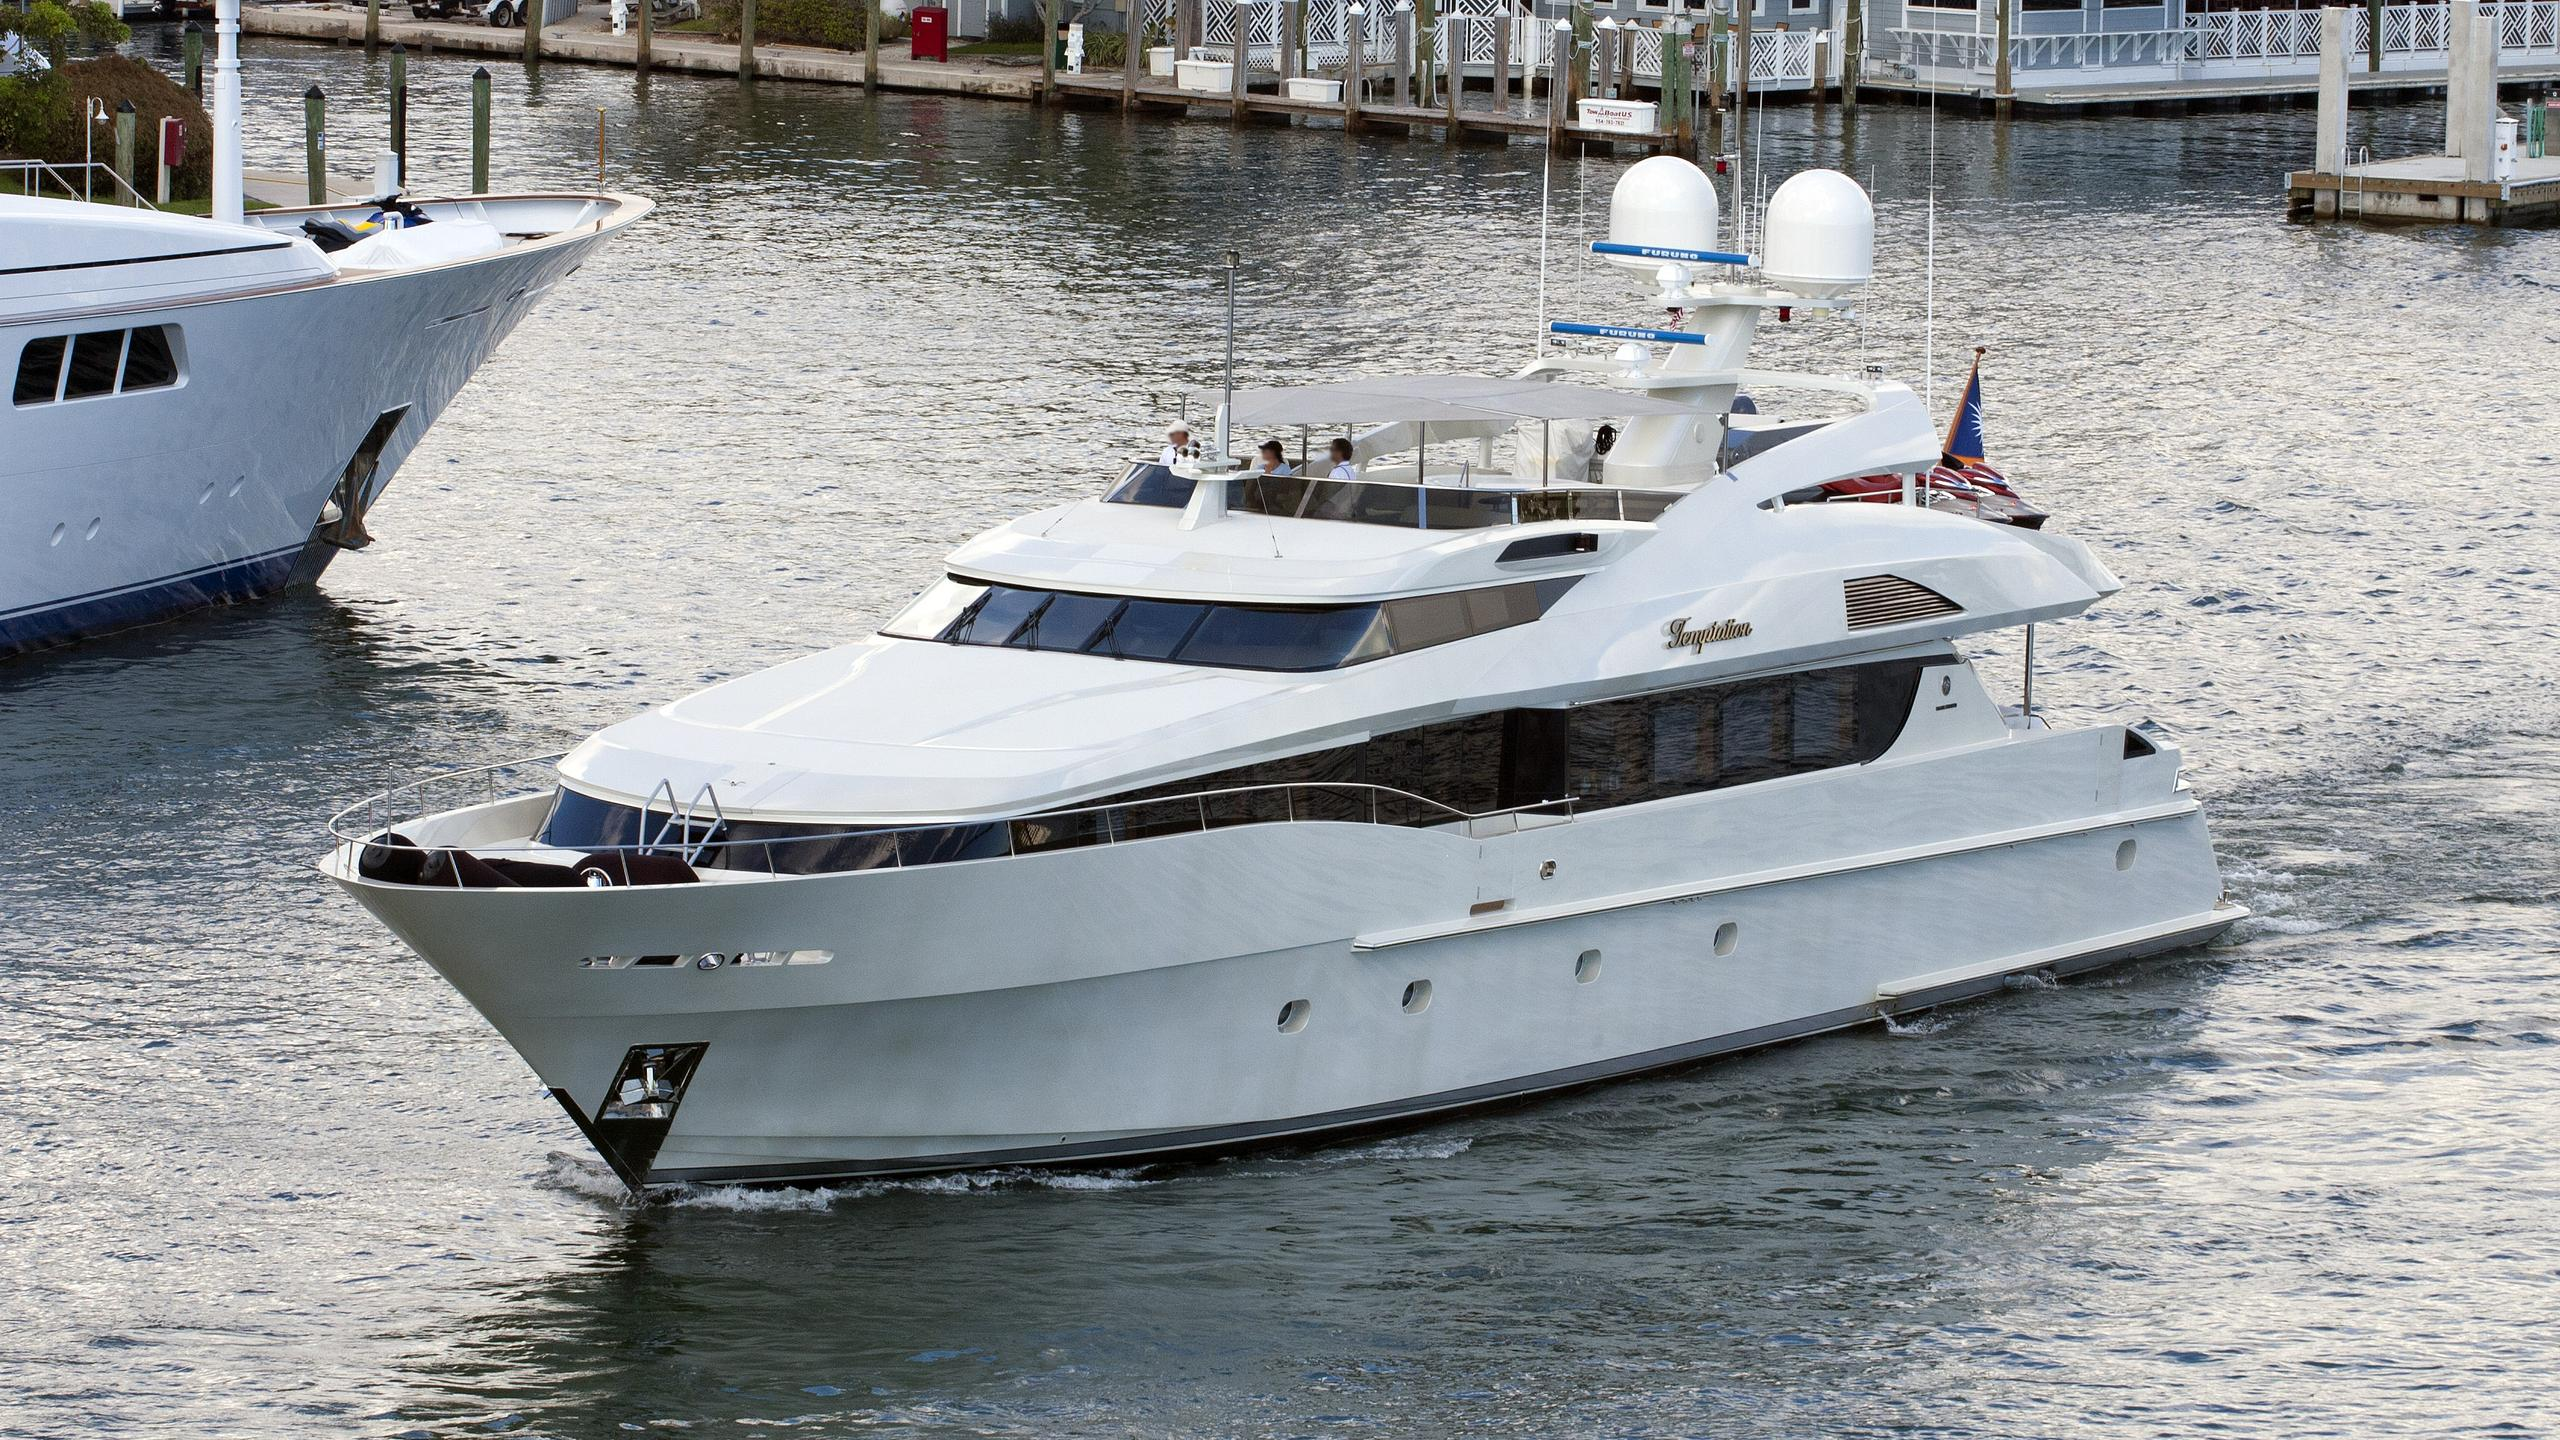 temptation-motor-yacht-palmer-johnson-123-fbmy-2004-38m-cruising